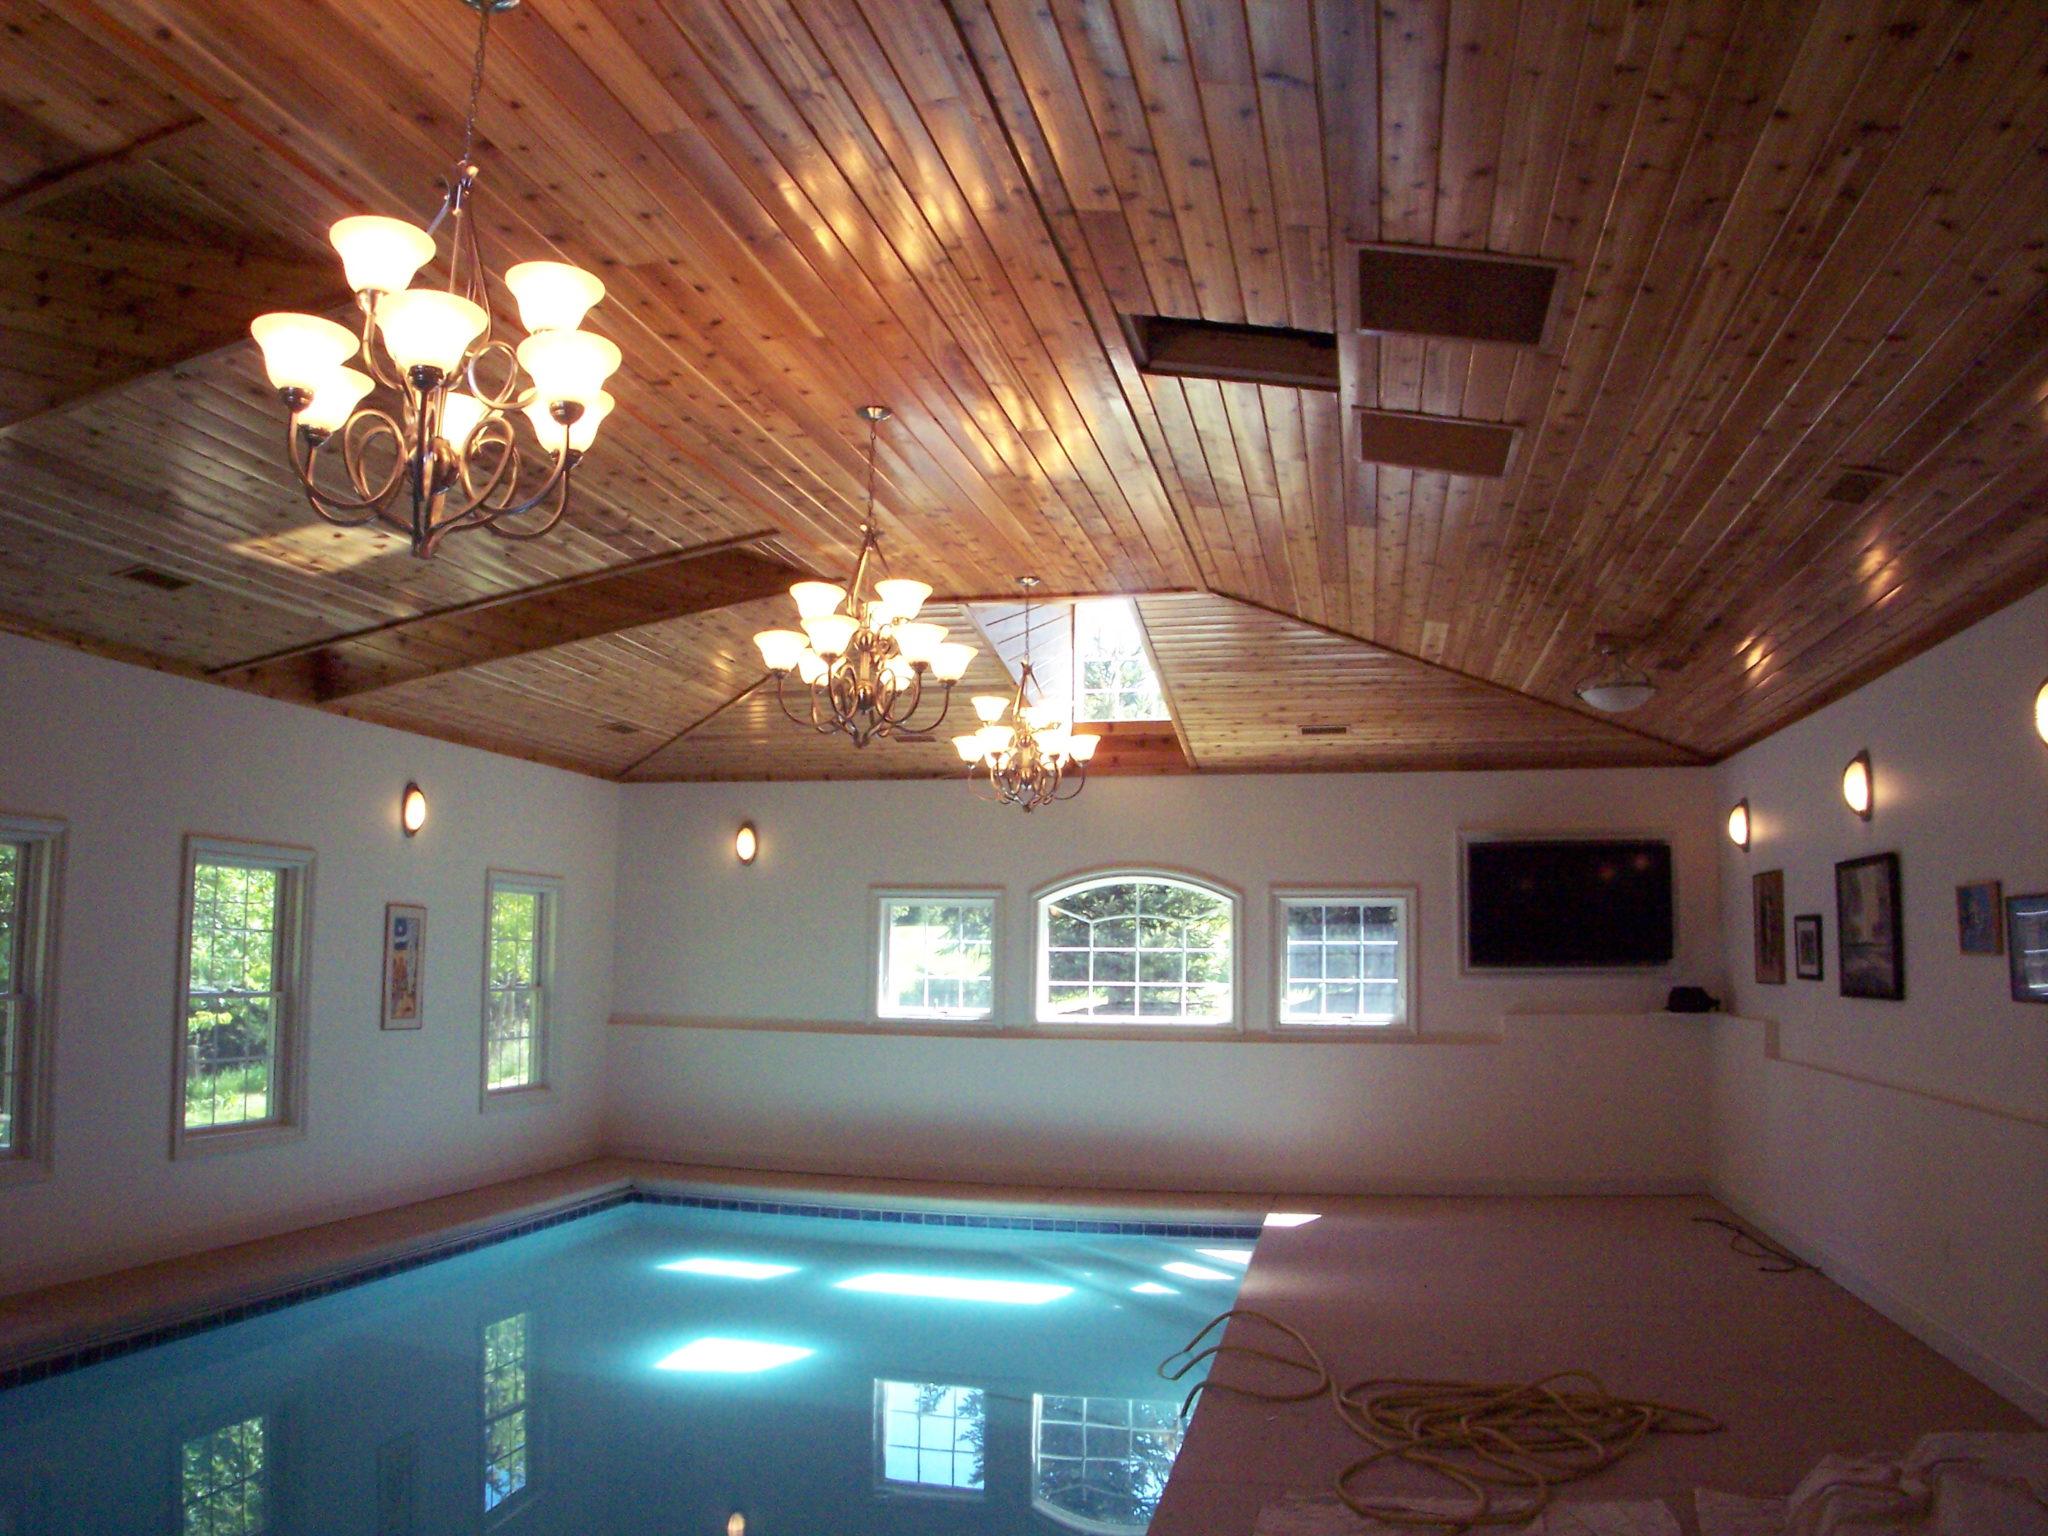 PoolHouse4